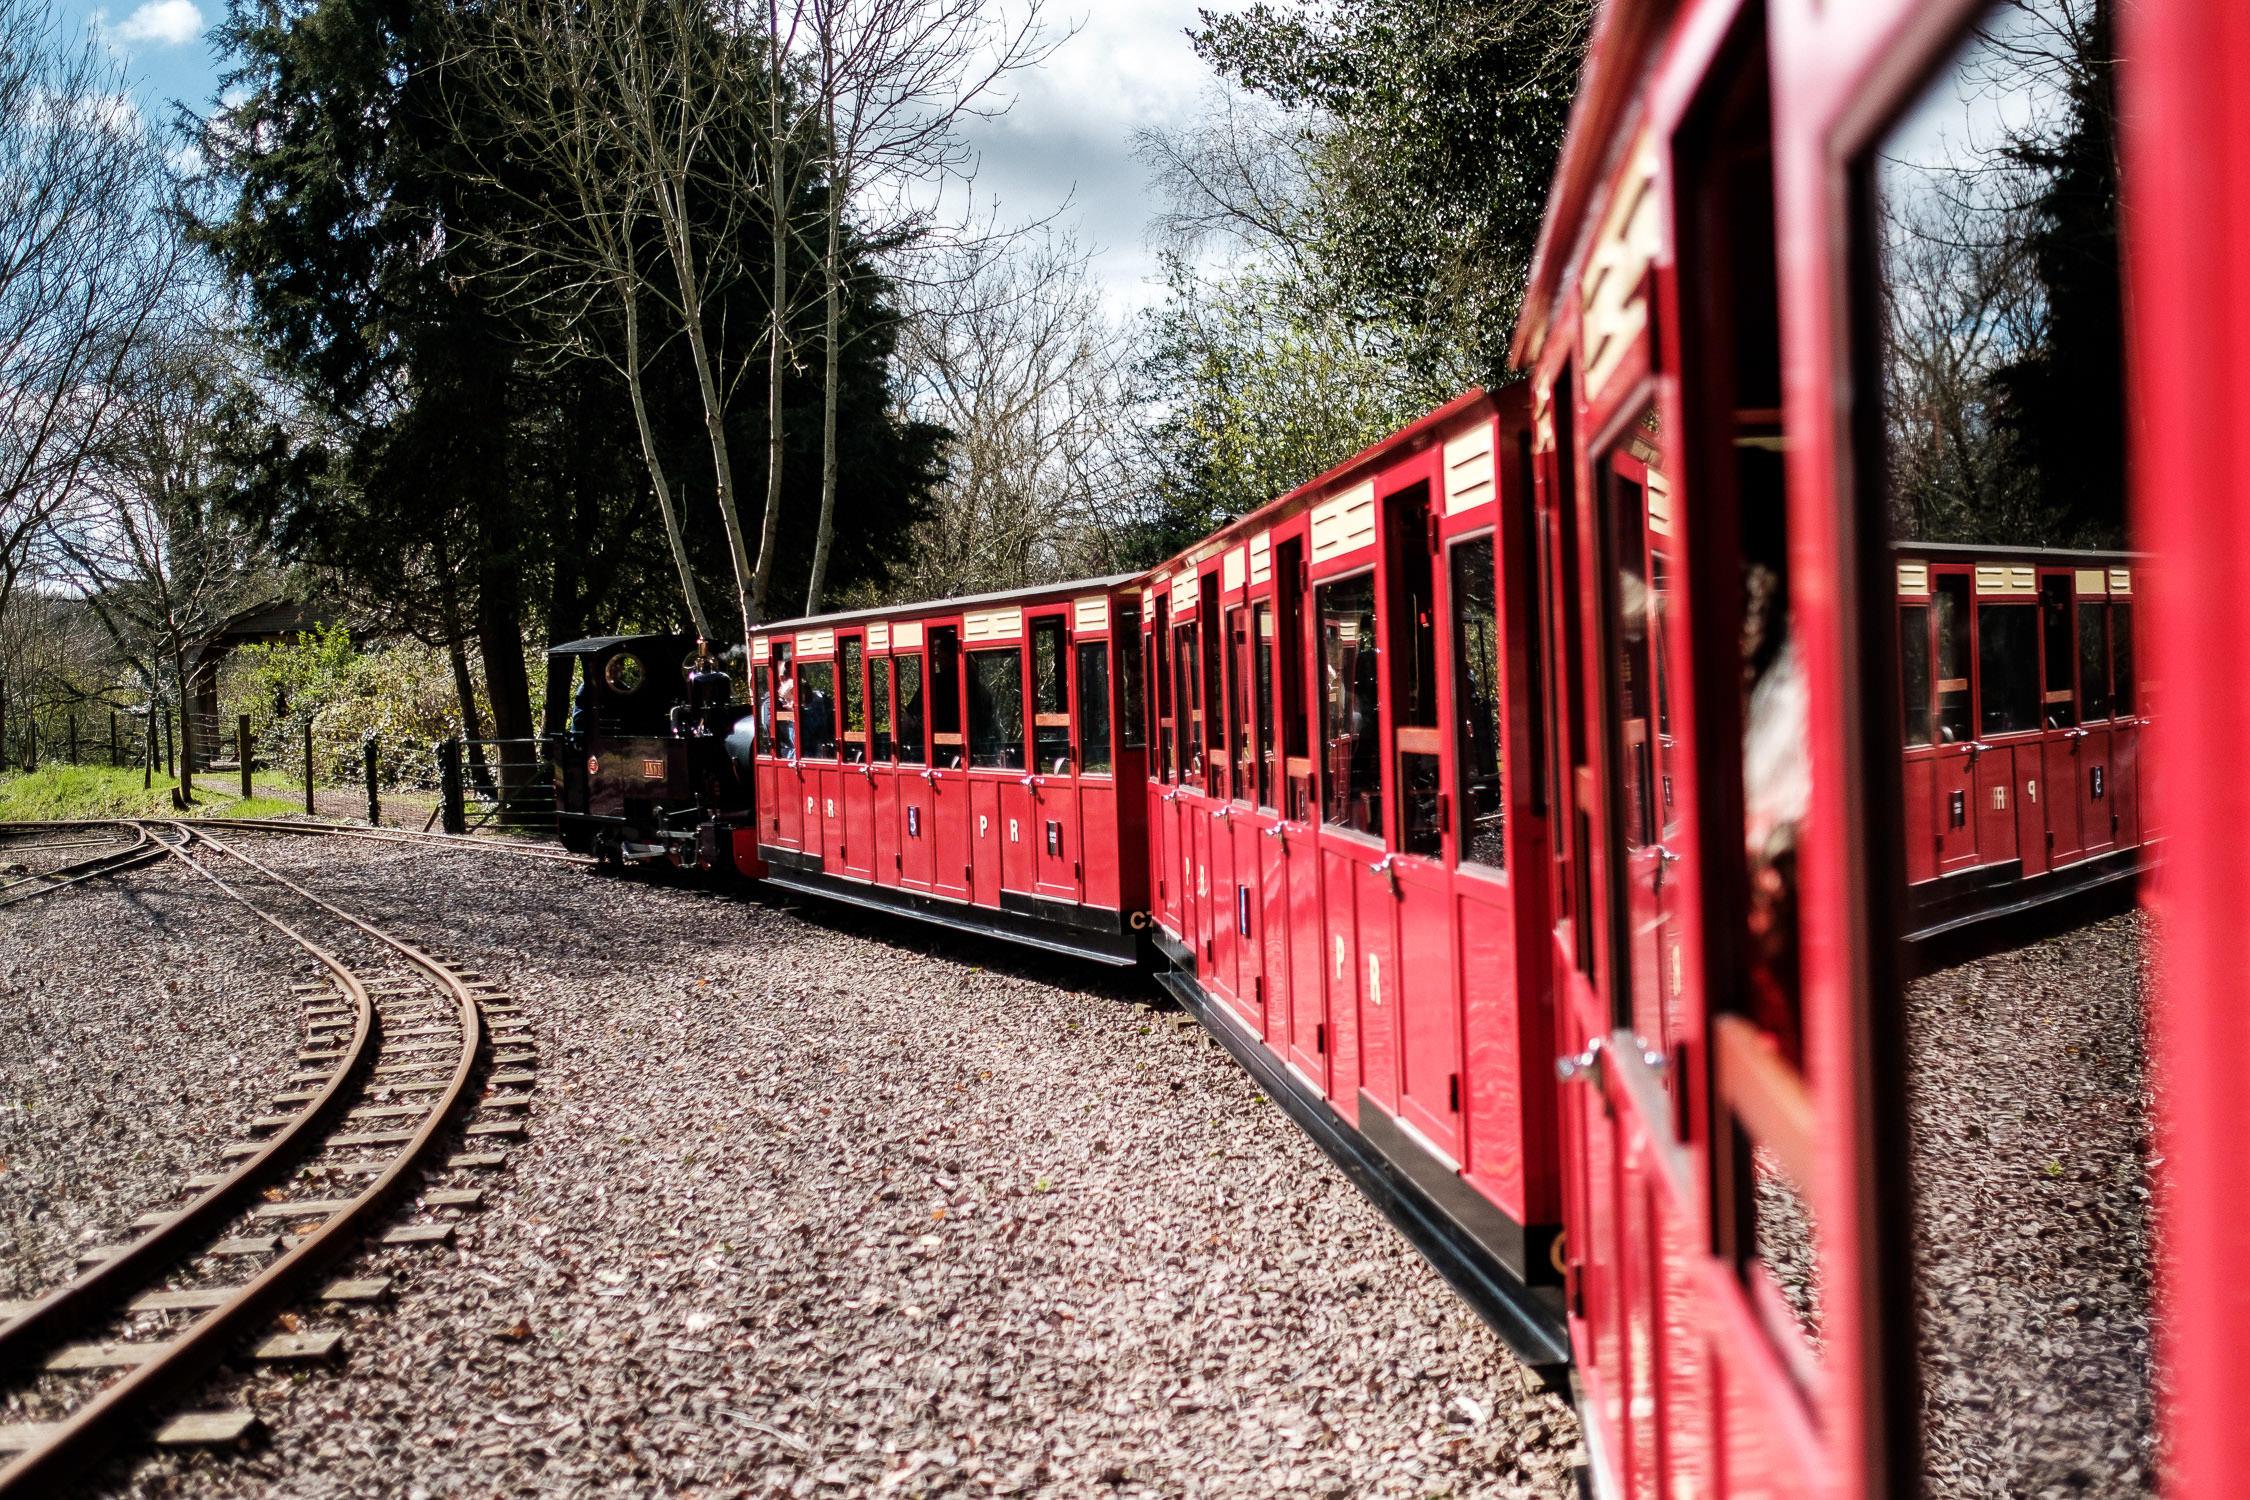 perrygrove railway train leaves station